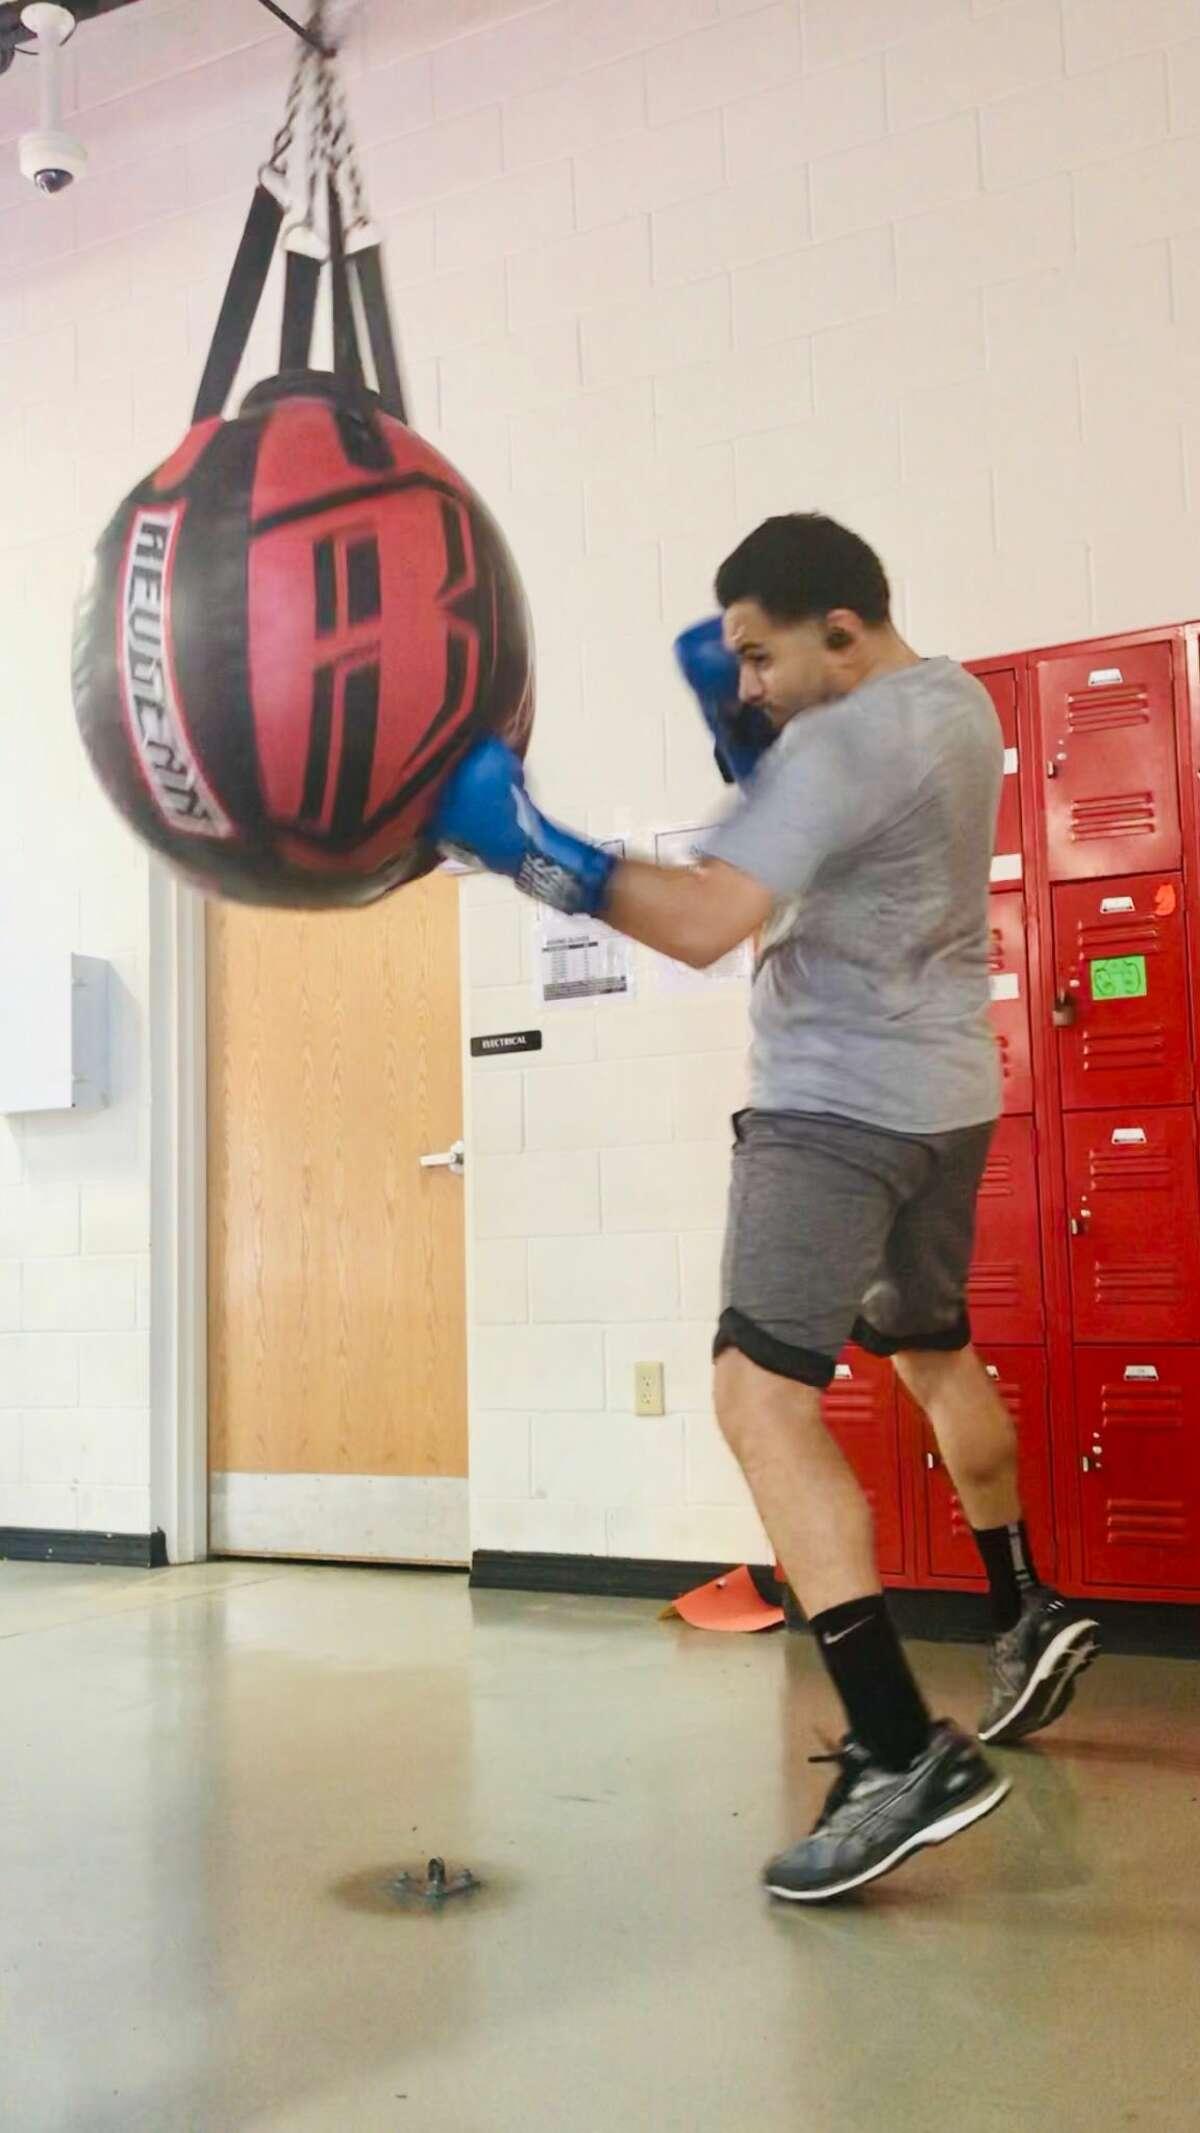 Chris Posada boxing at Marcos J. Aranda Recreation Center